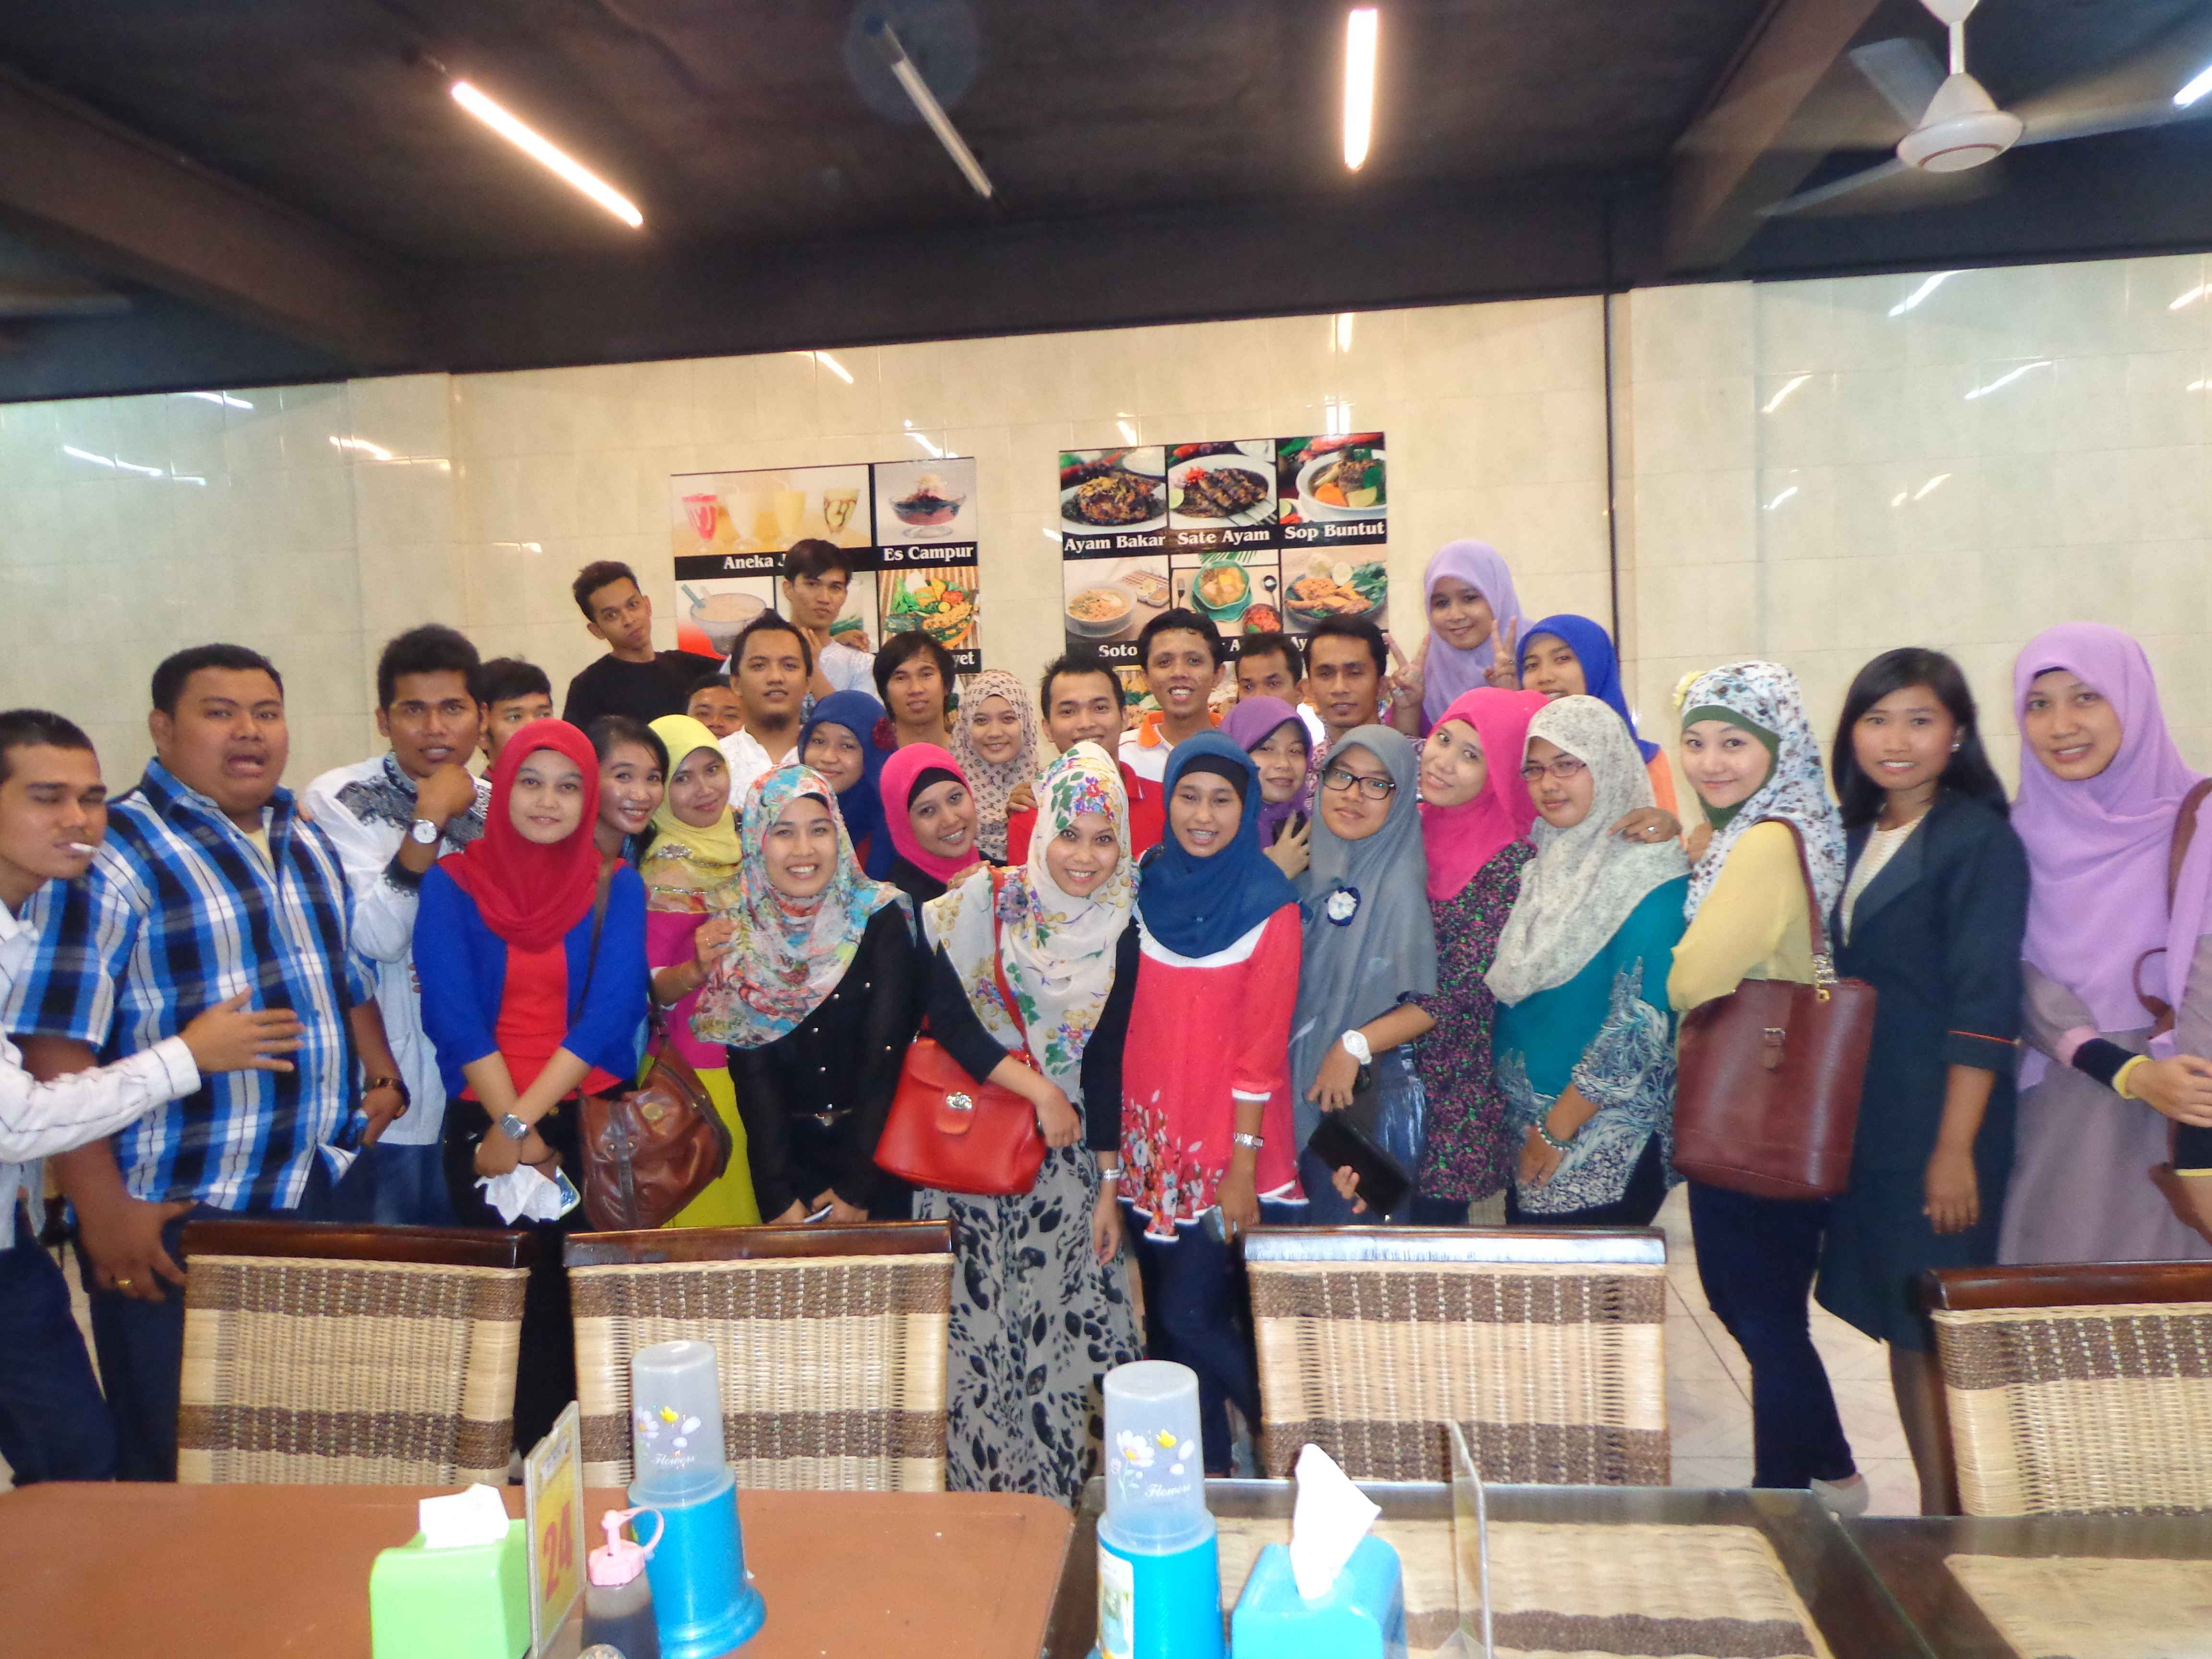 Buka bersama alumni 2008 SMA N 3 Mandau tahun 2013